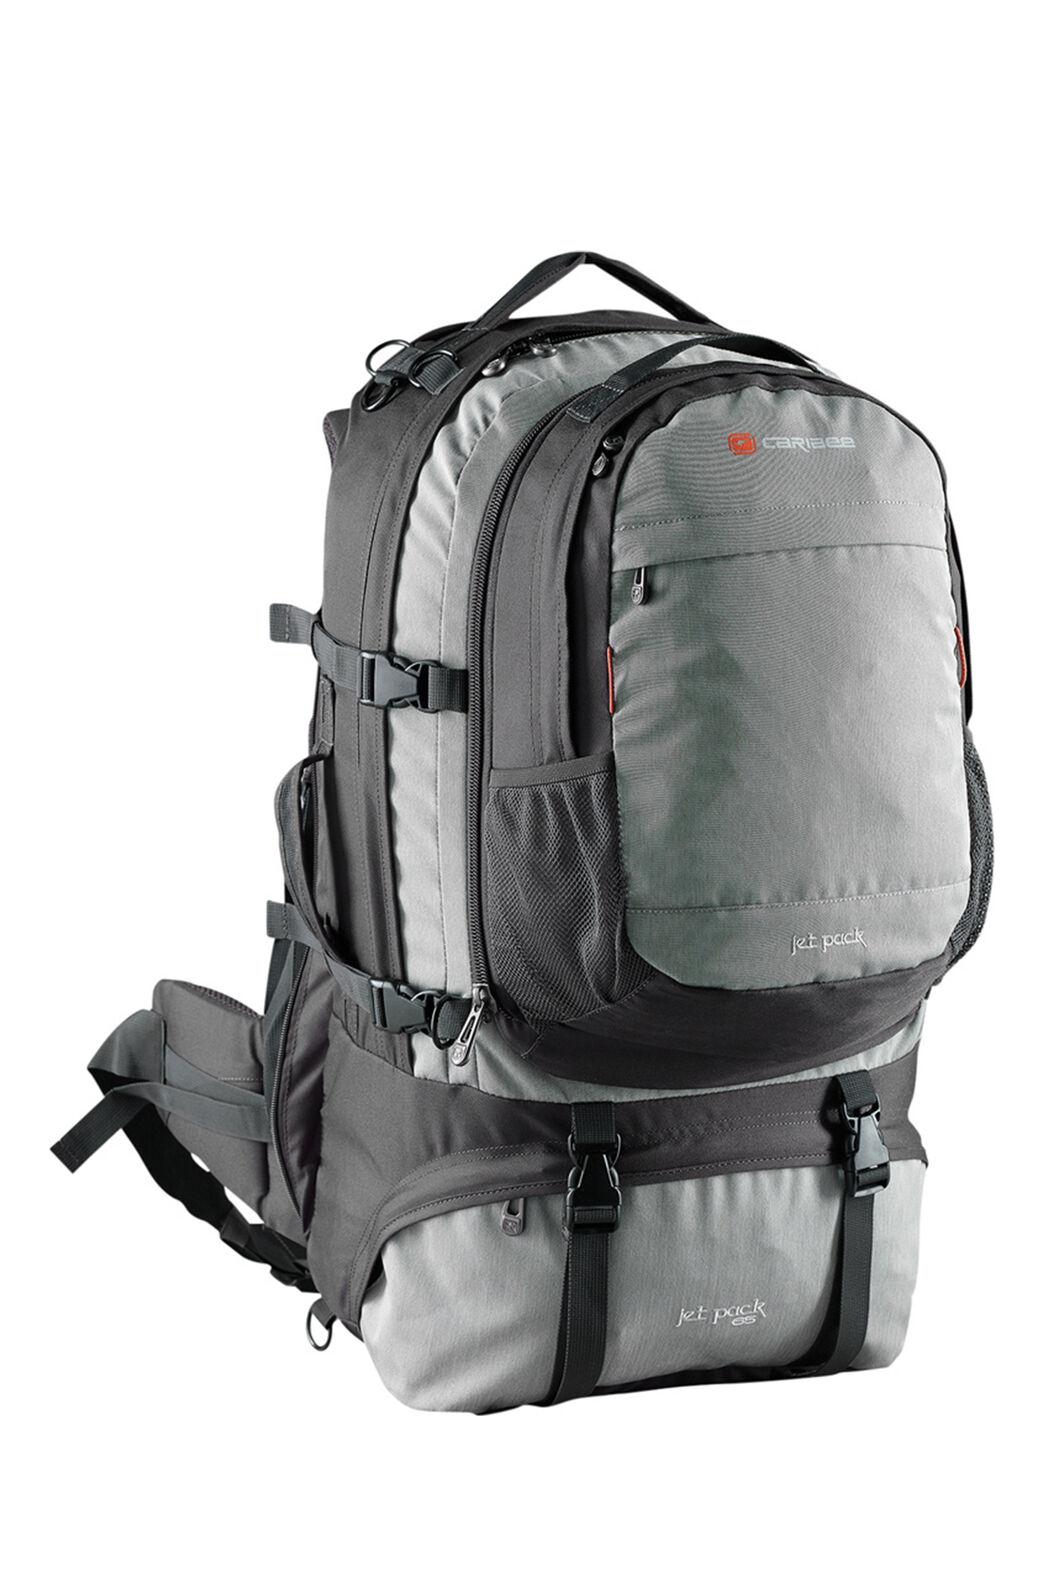 Caribee Jet Pack Travel Pack 75L, None, hi-res